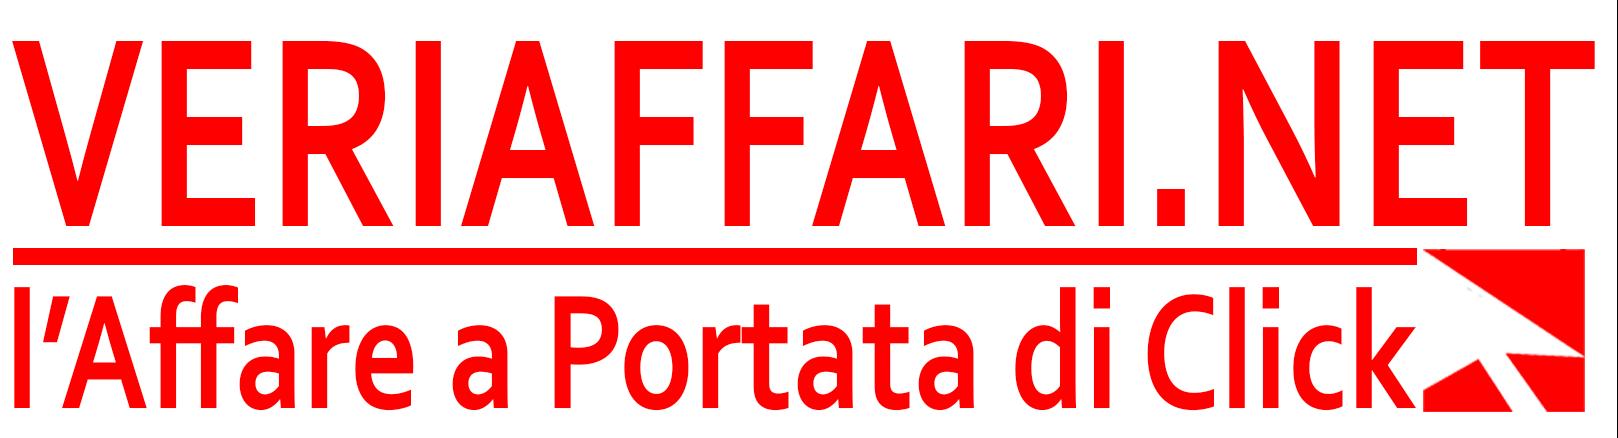 Veriaffari.net